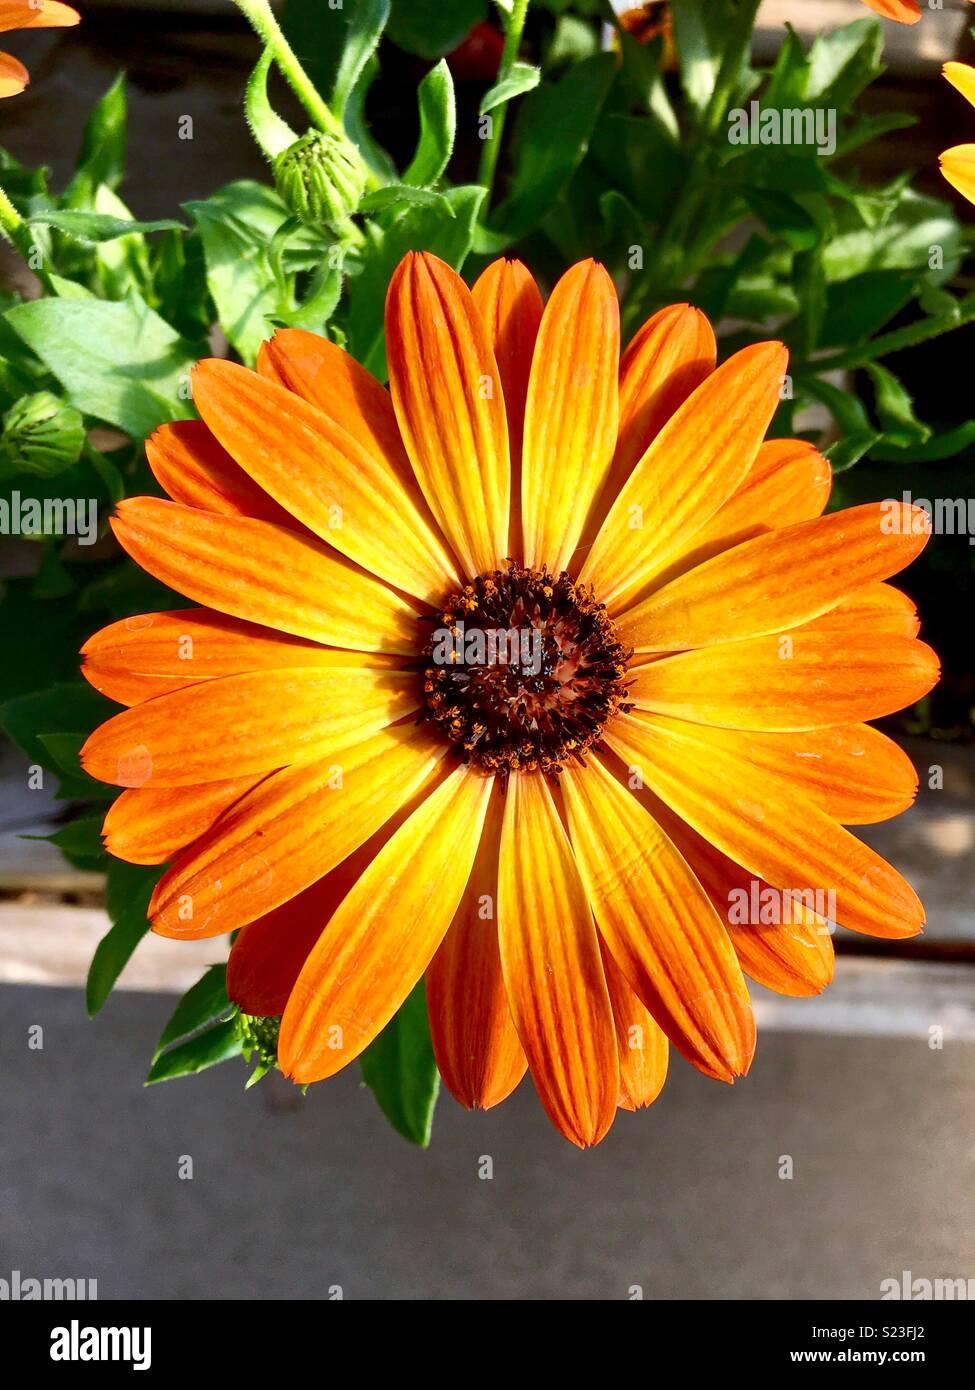 Margarita orange flair cape daisy - Stock Image